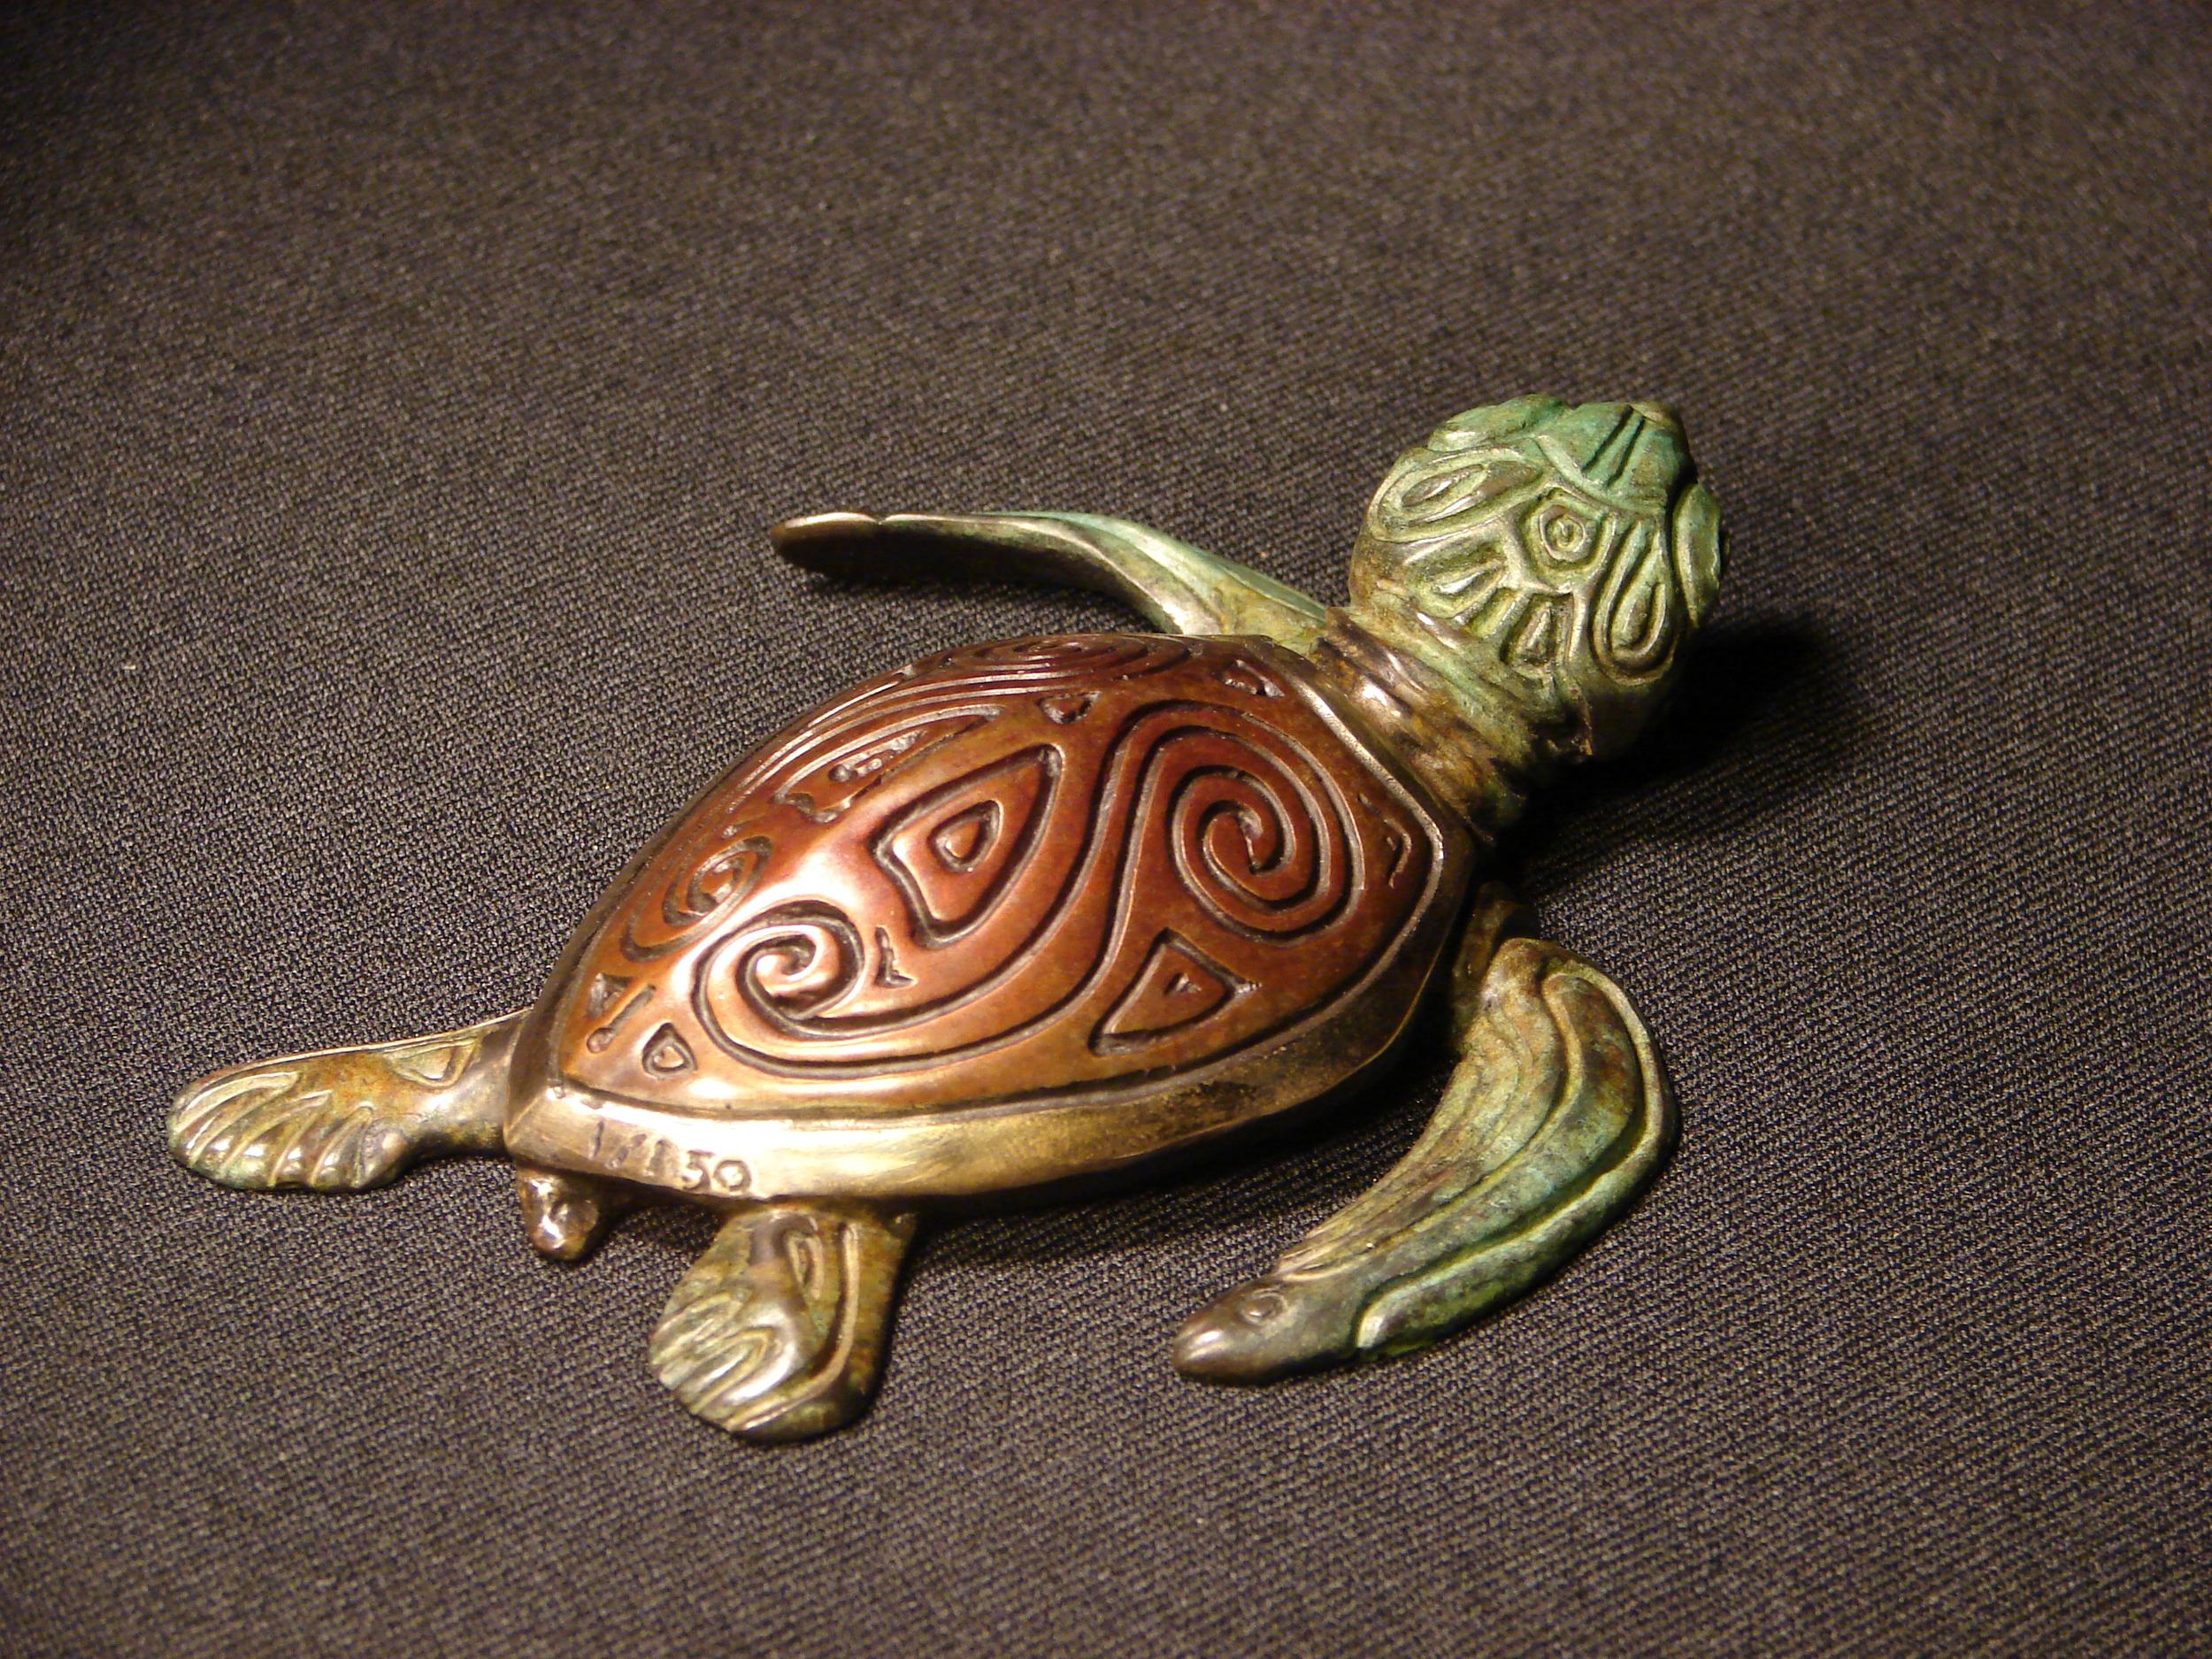 bronze-sea-turtle-sculpture-john-maisano-2.jpg